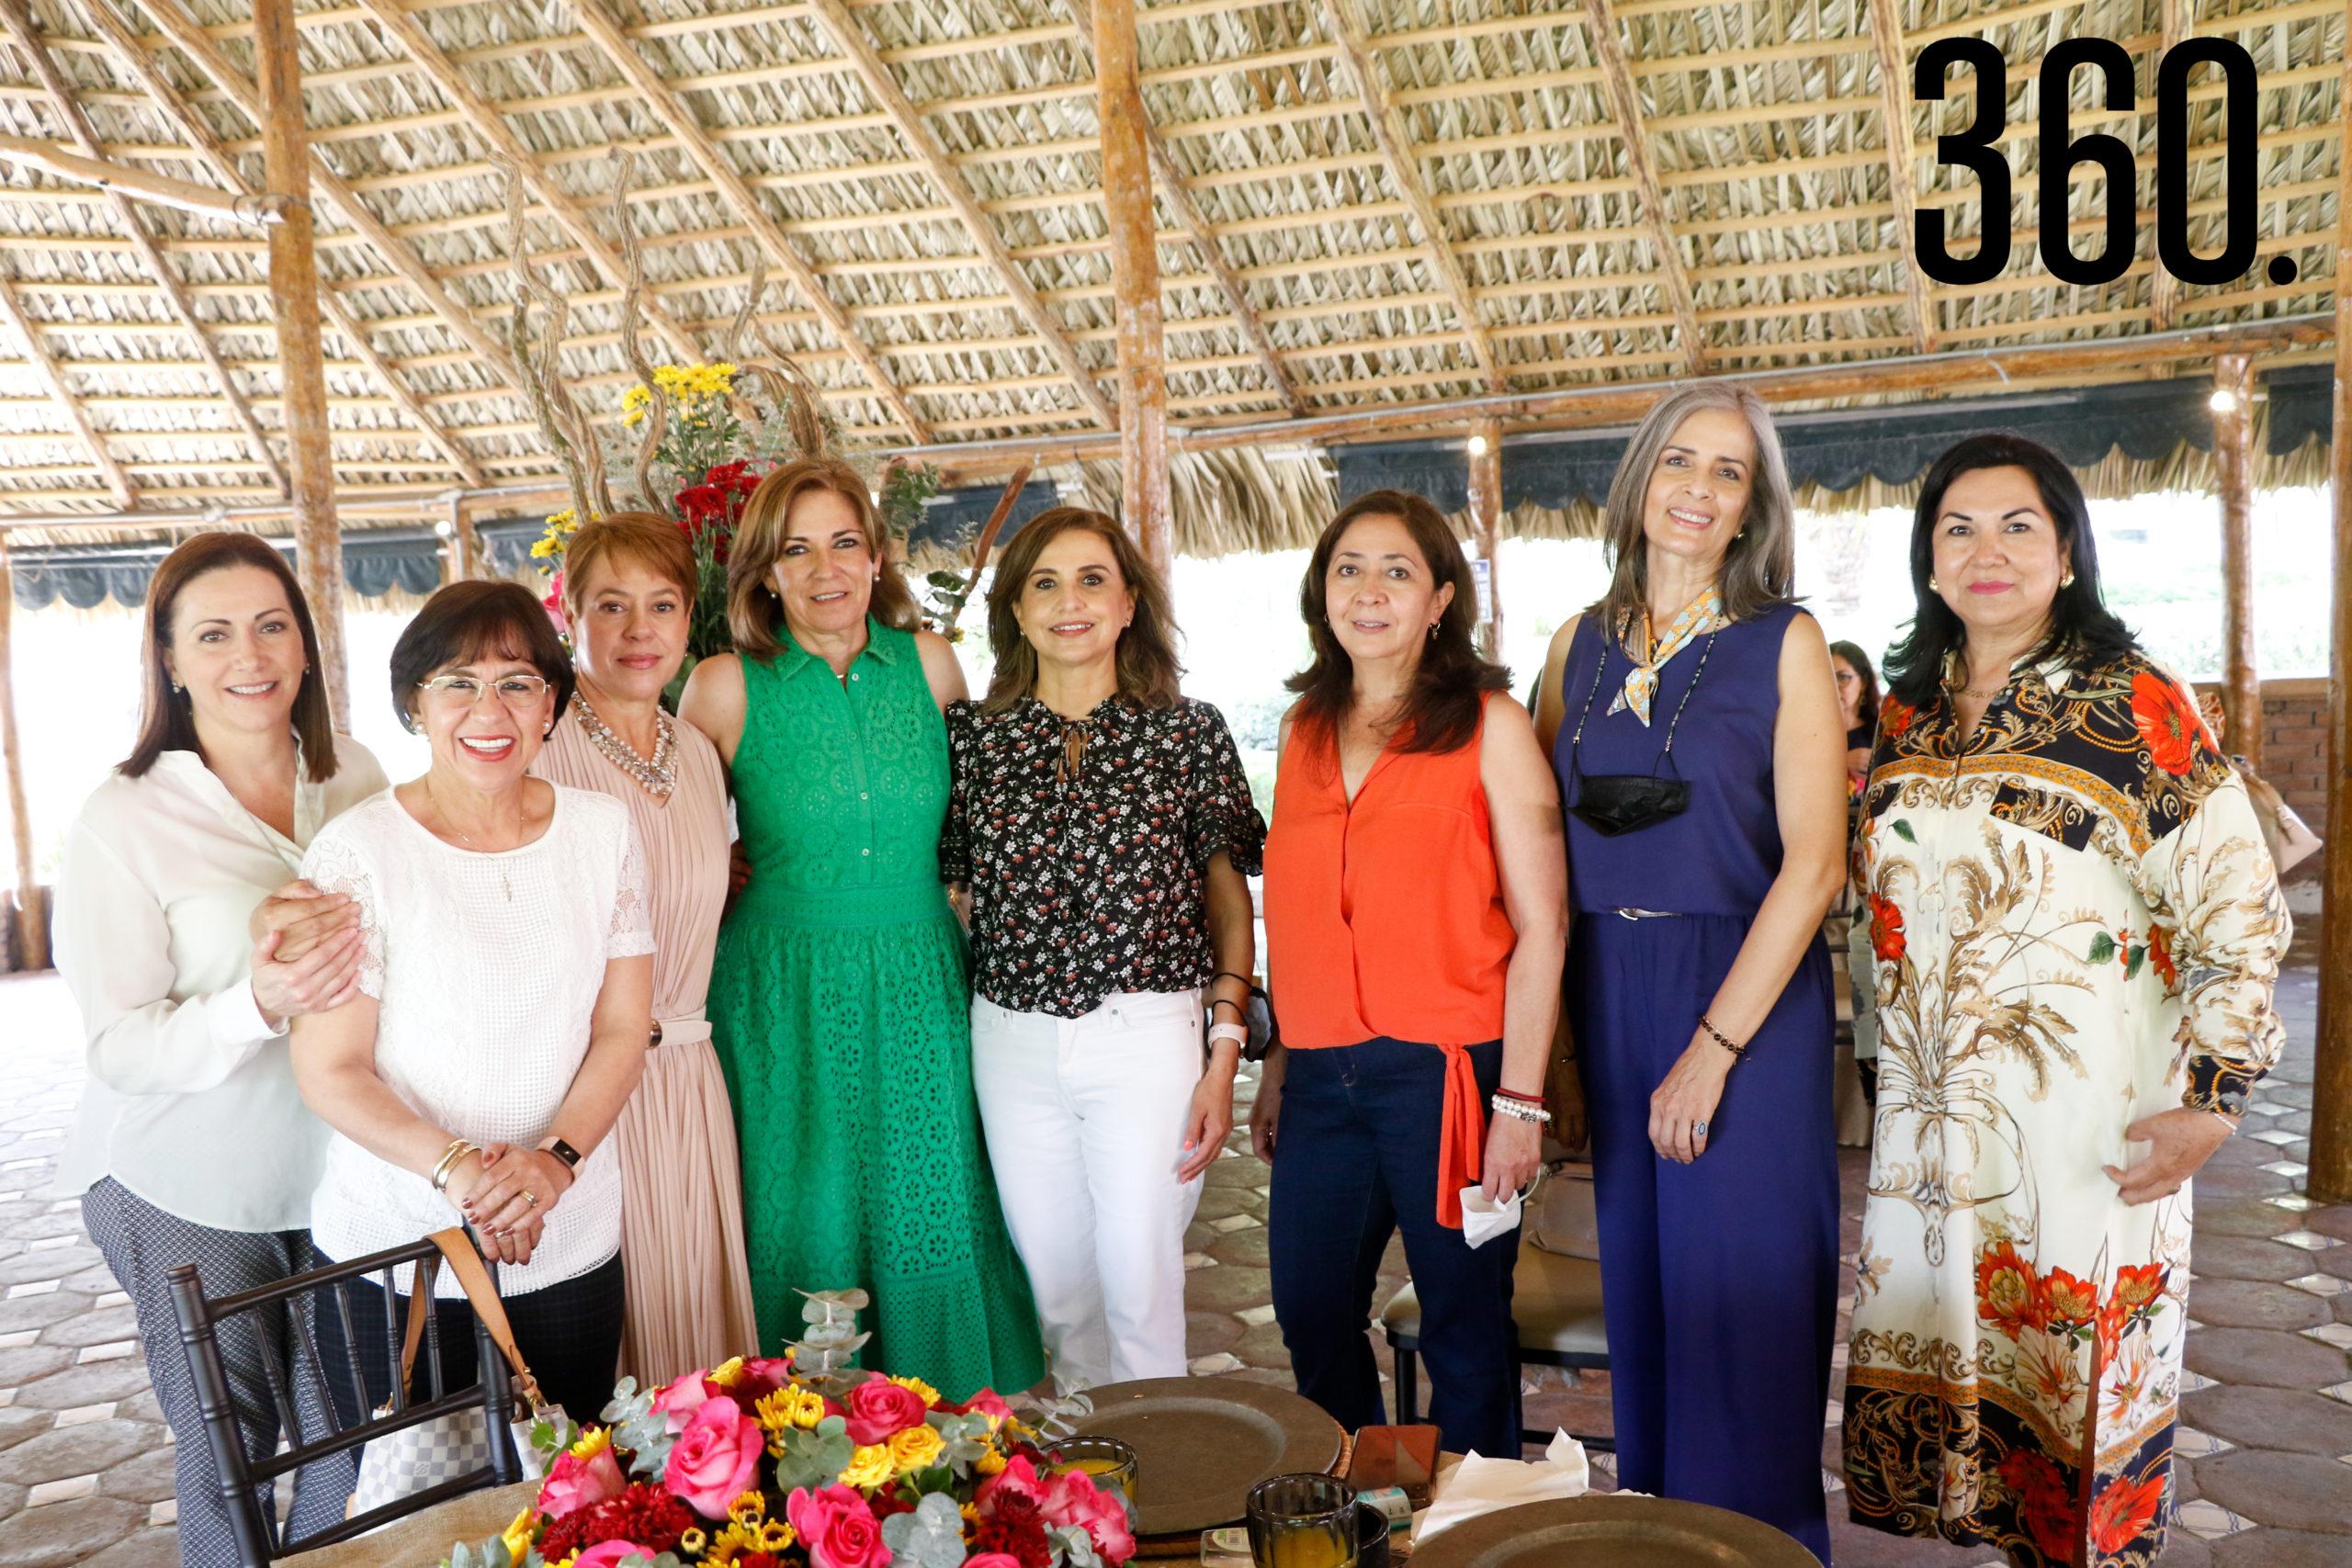 Mónica con Lucía Dávila, Marcela de González, Cristina Yates, Rosa Elena Hernández, Esperanza García, Cilia Concha y Carmen de Marines.